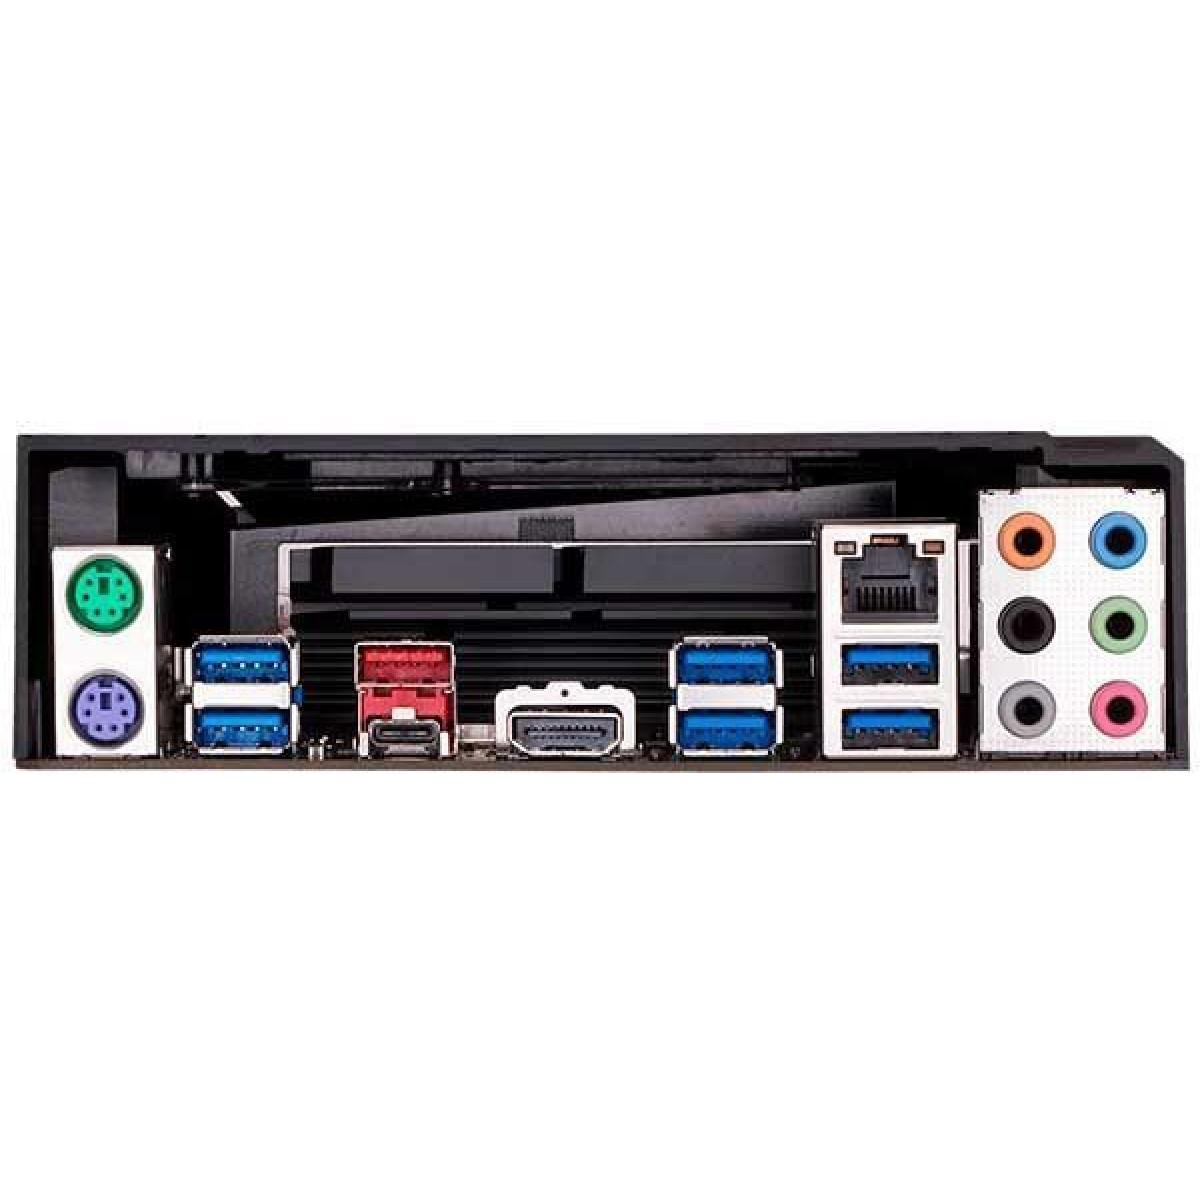 Placa Mãe Gigabyte Z370XP SLI DDR4 SLI/Crossfire LGA 1151